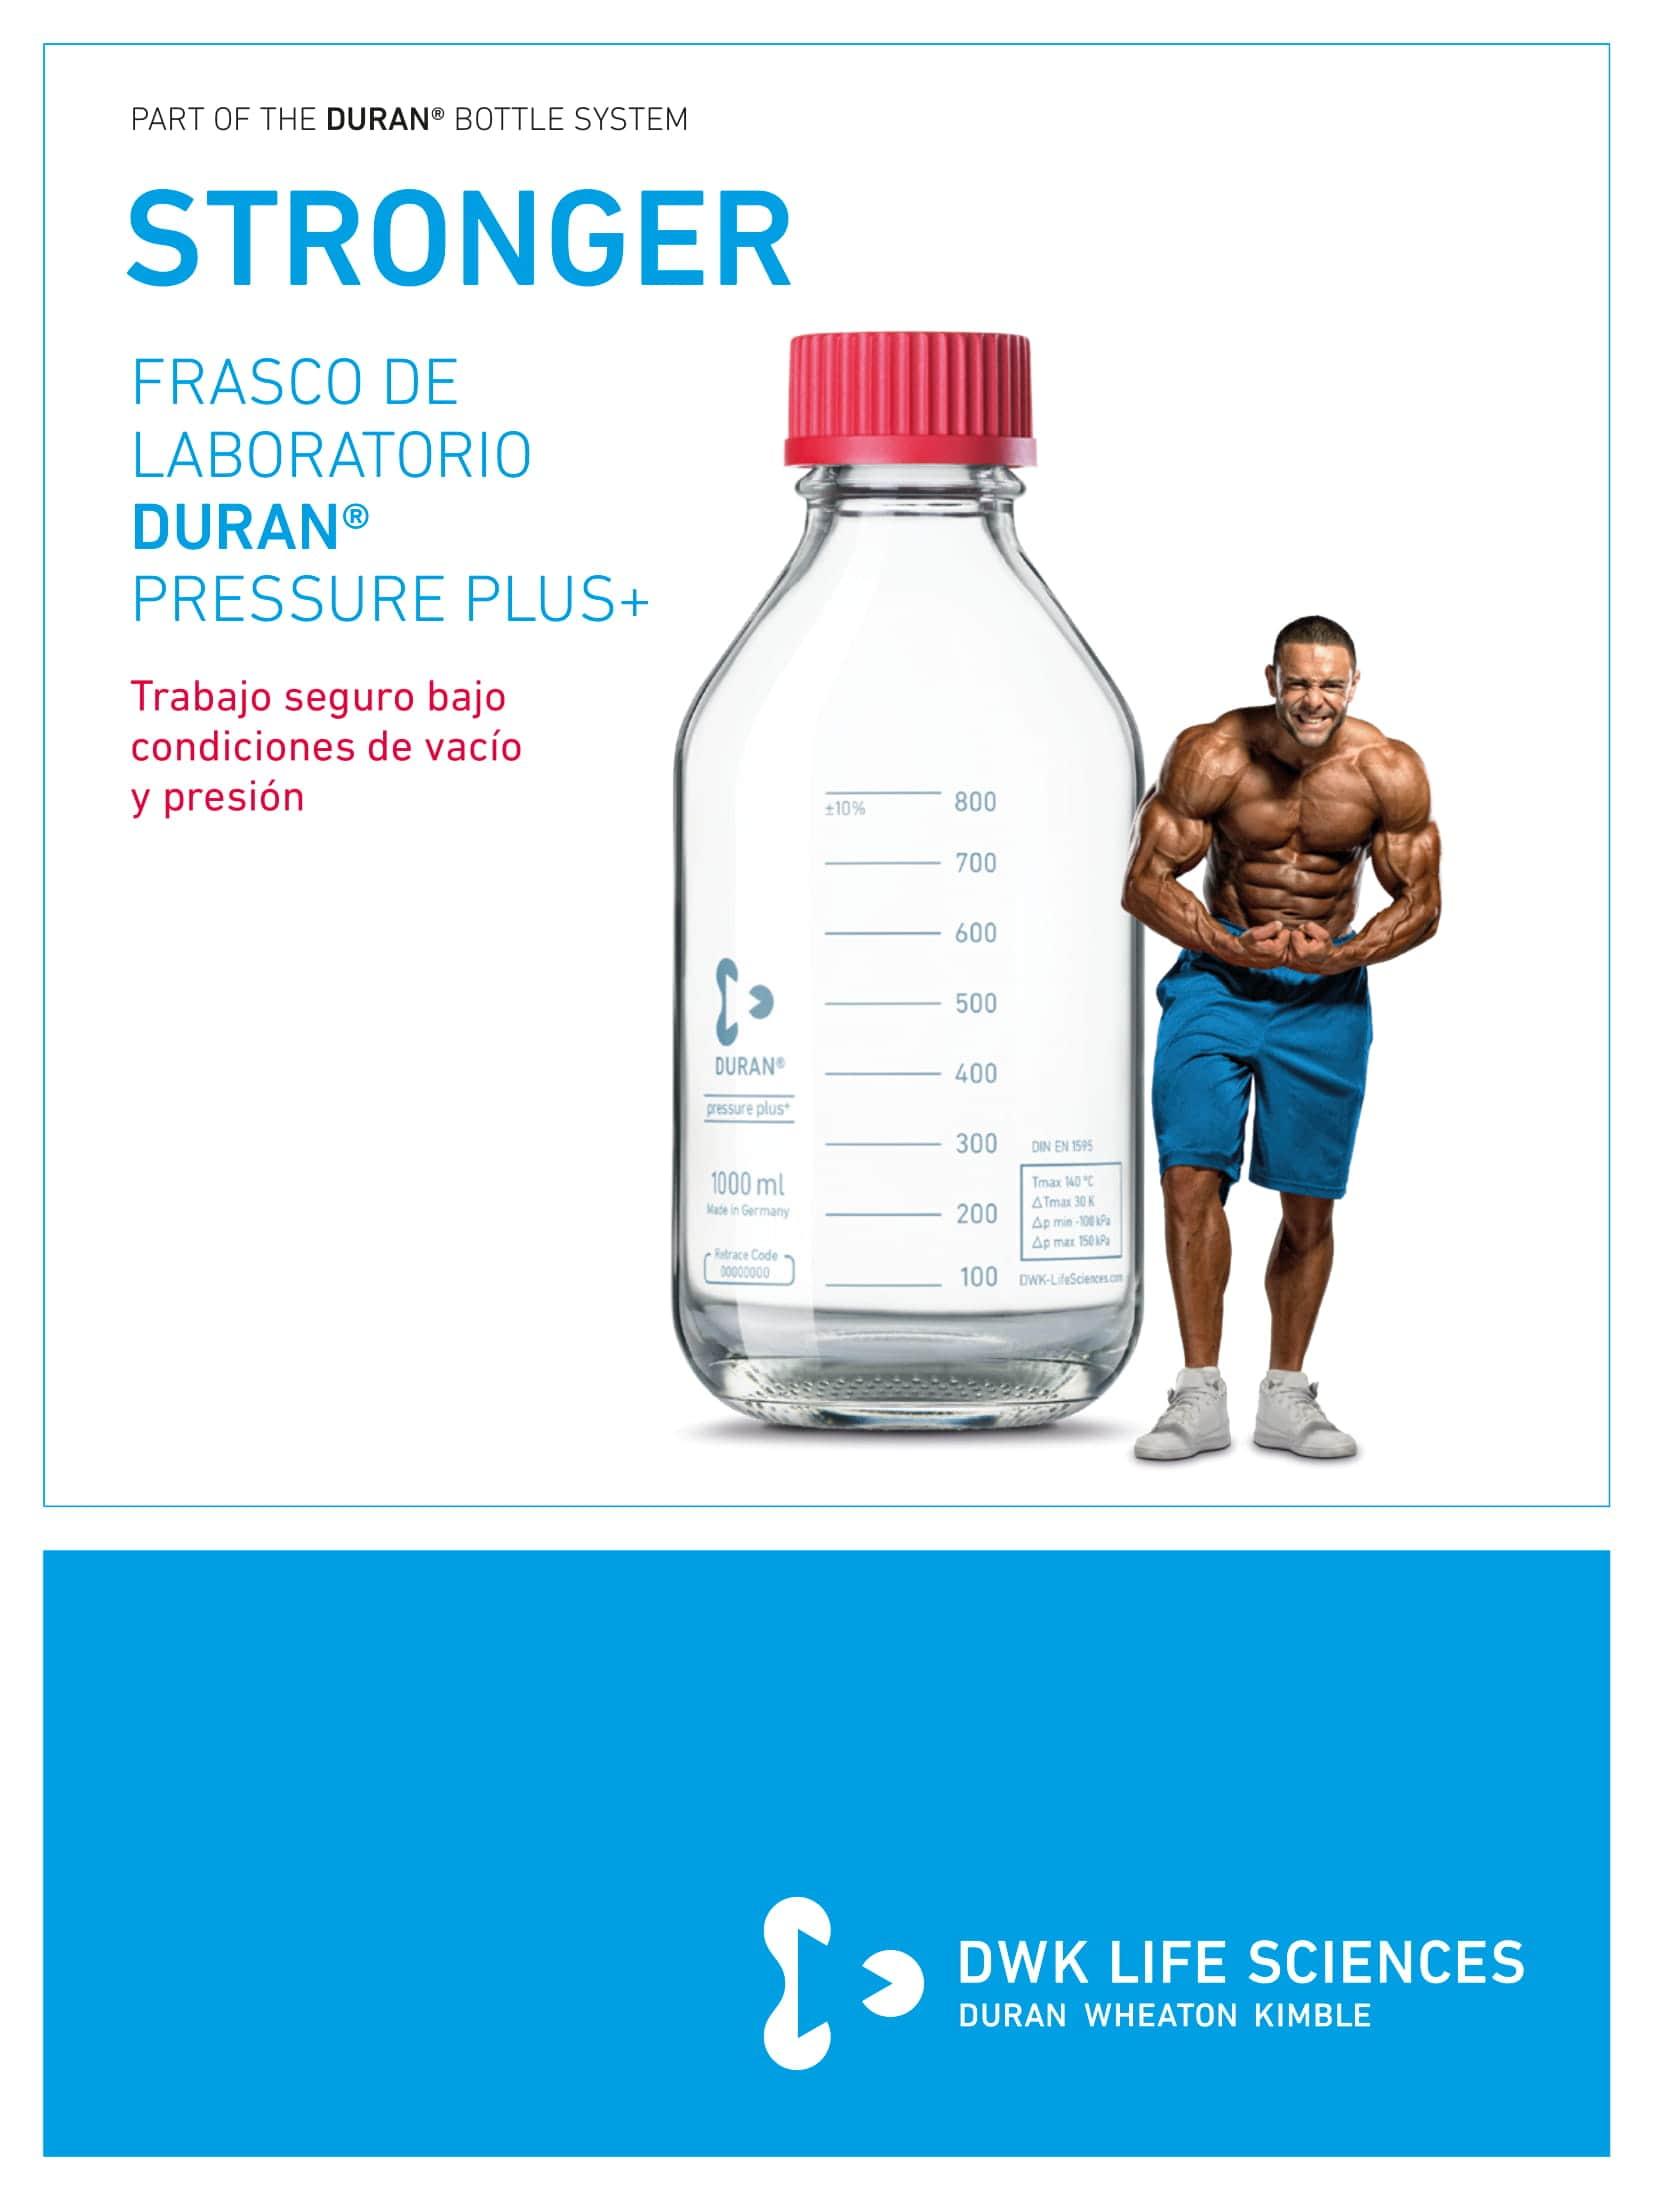 DURAN® Laboratory Bottle Pressure Plus+ GL 45 Spanish